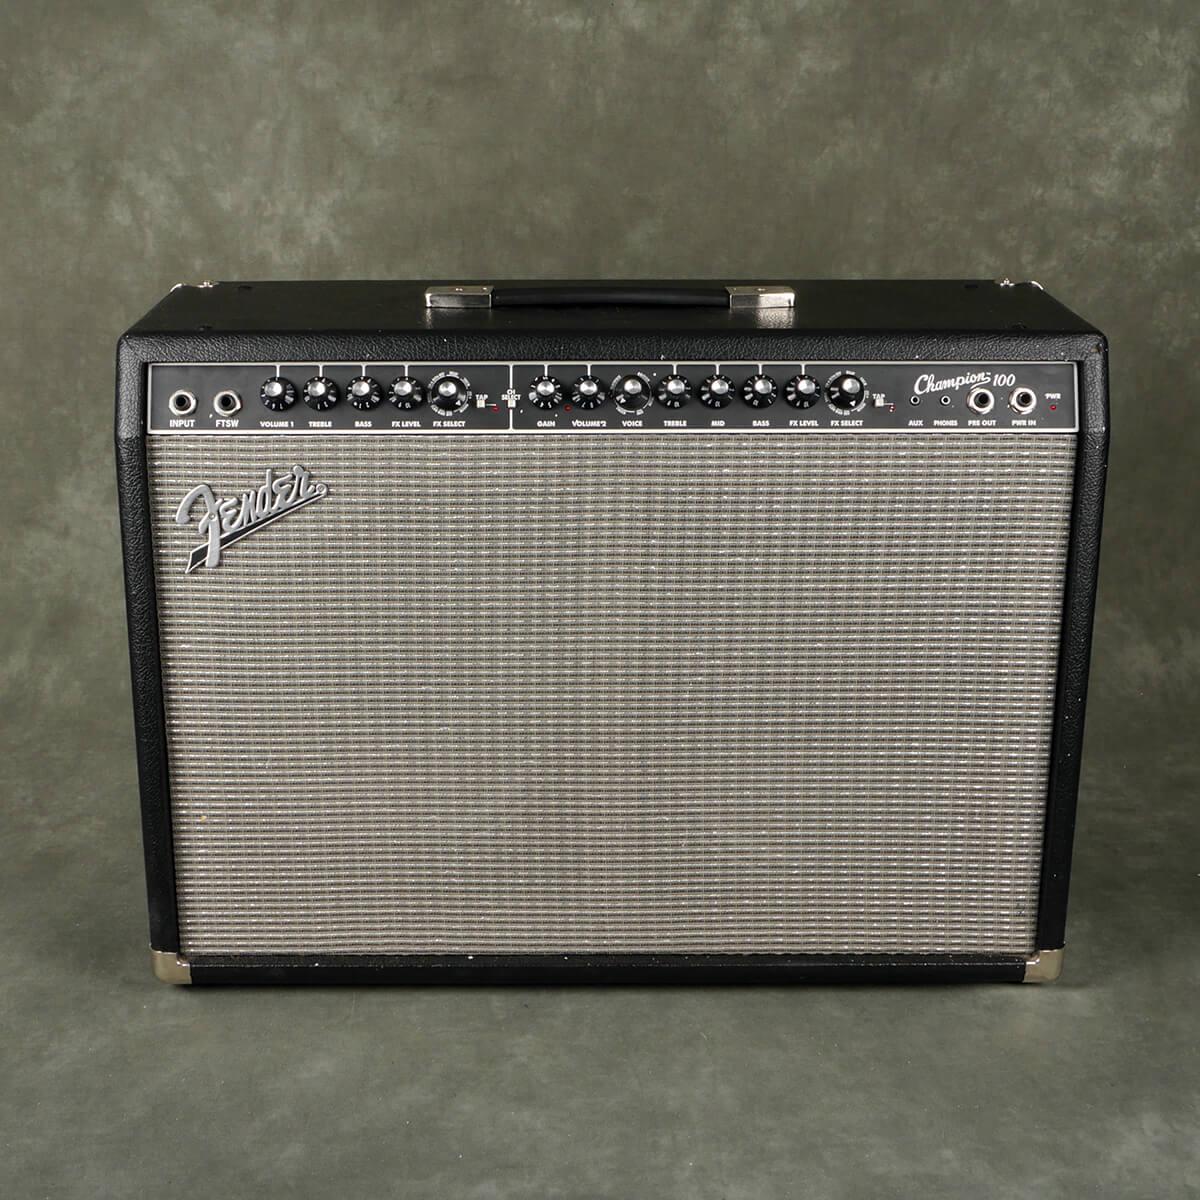 Fender Champion 100 Guitar Combo Amplifier - 2nd Hand